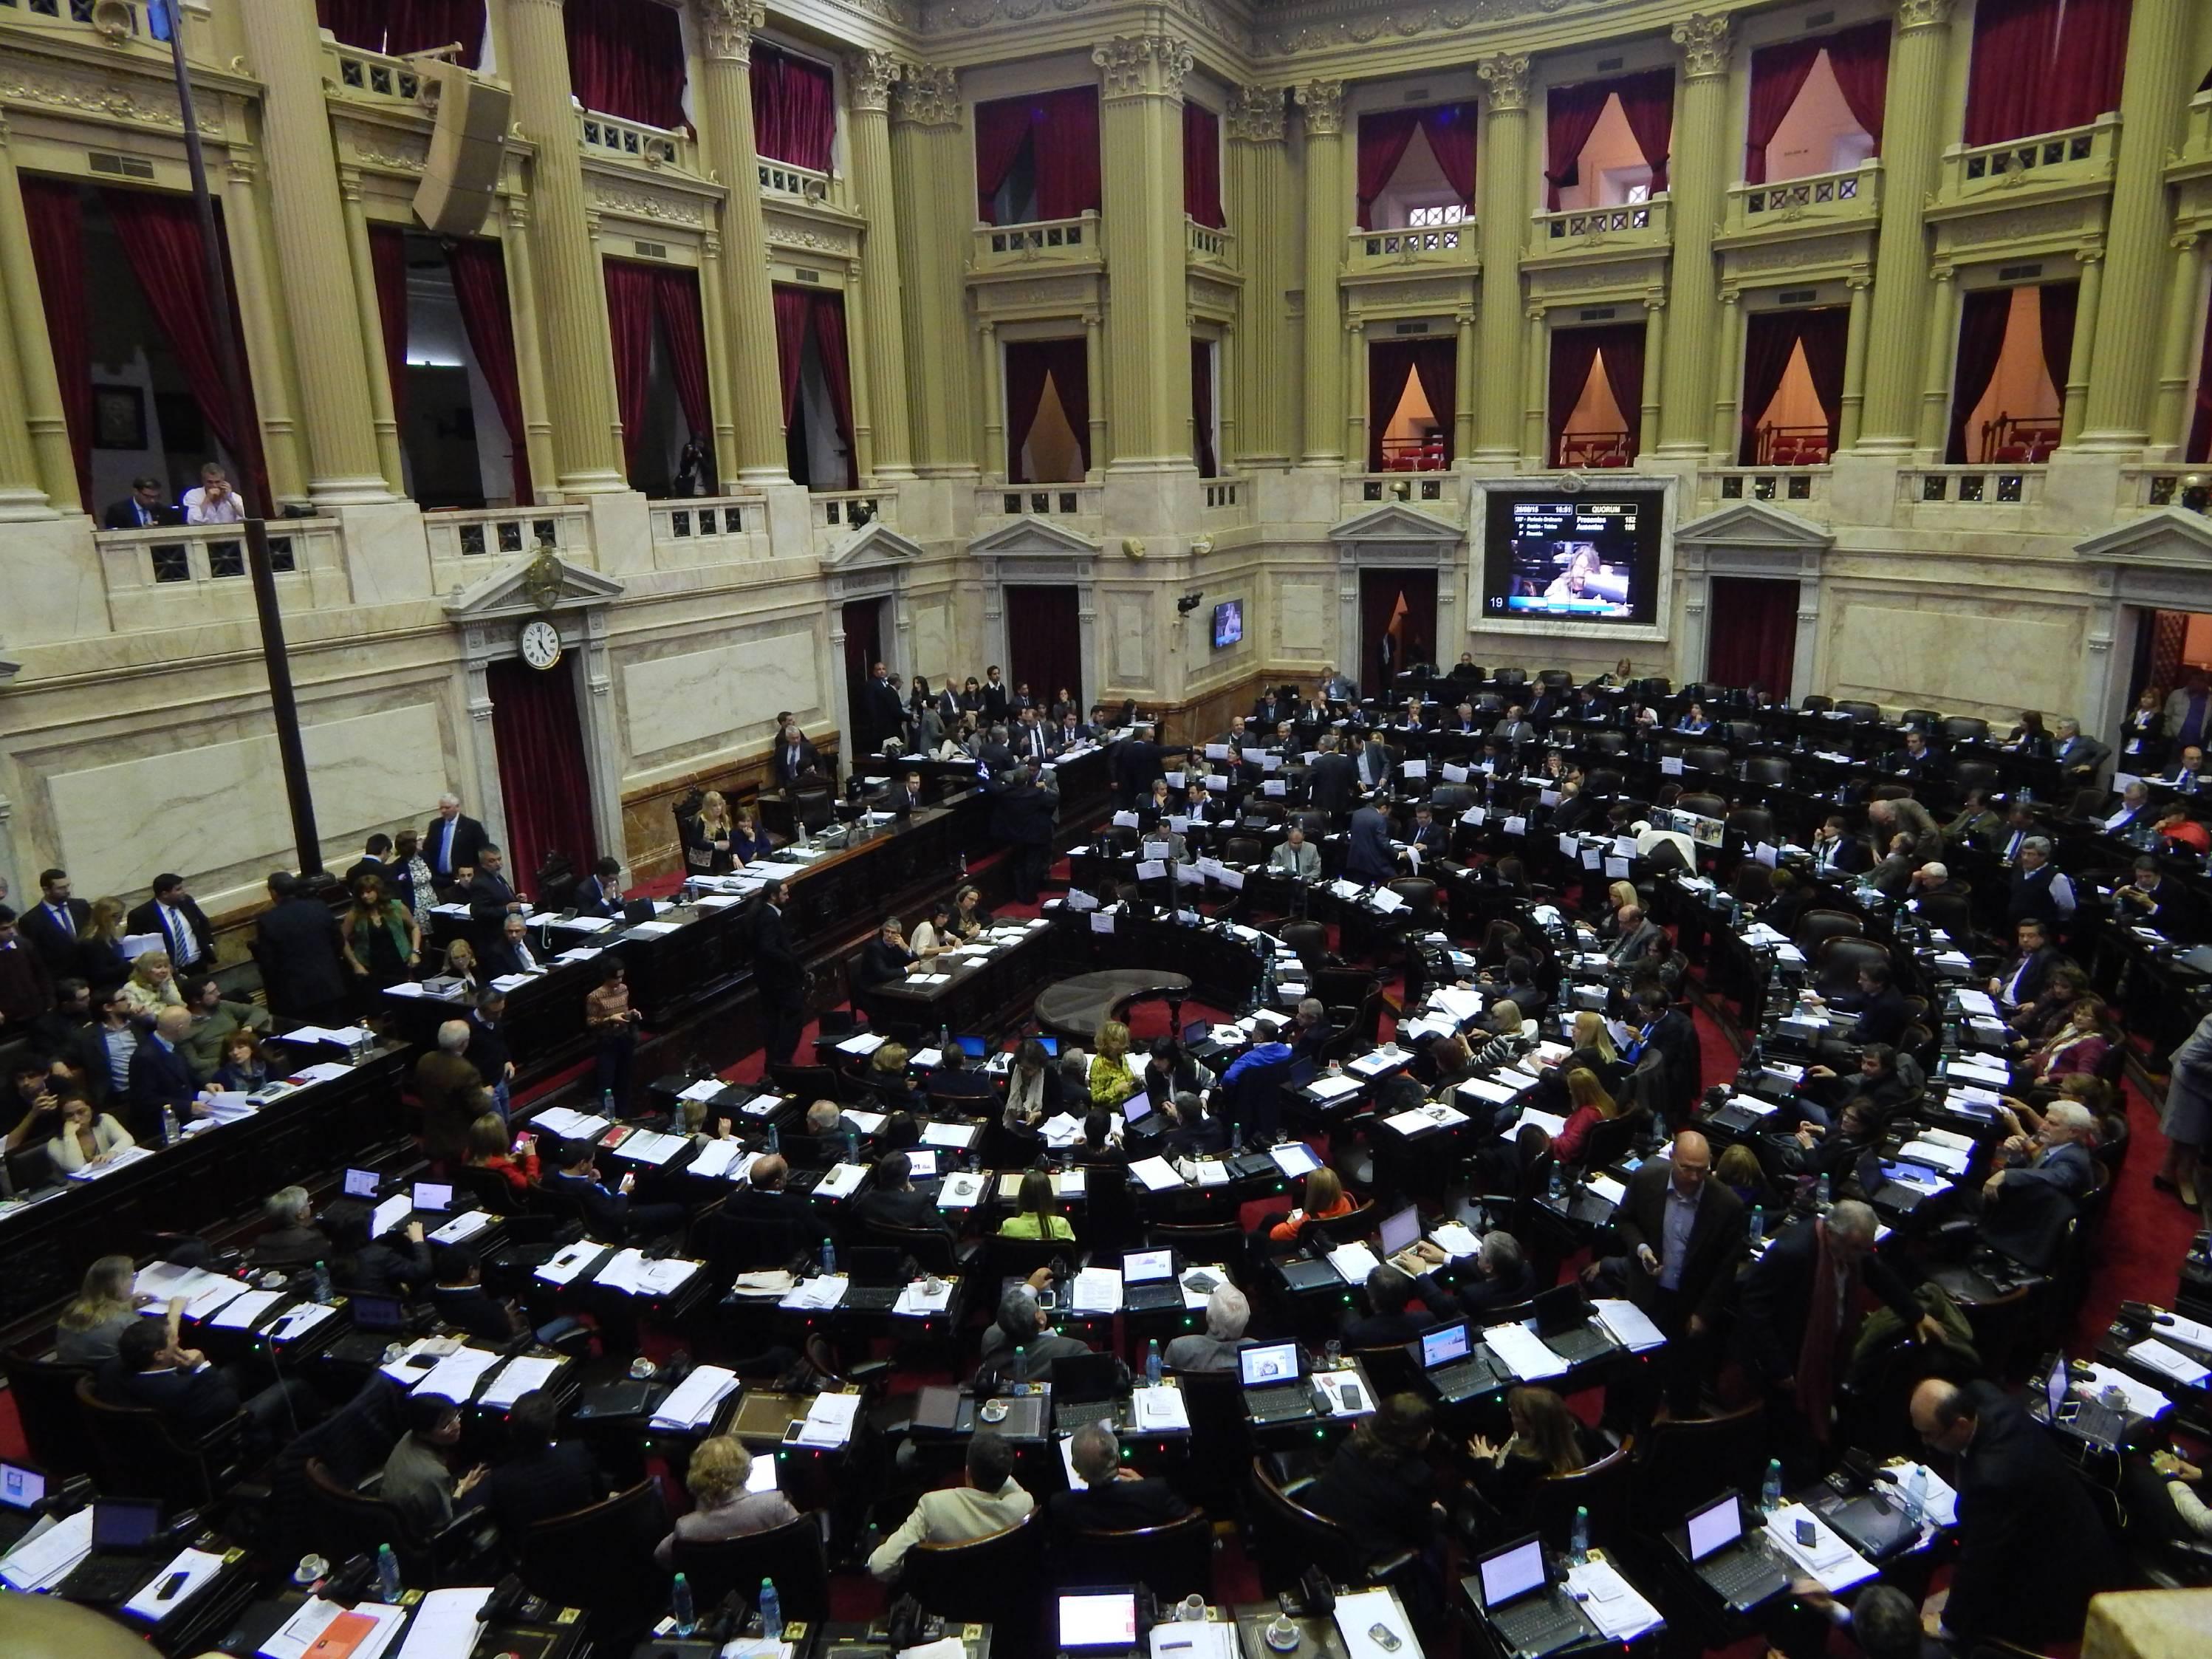 Diputados_aprobó_creación_de_la_Agencia_Nacional_de_Materiales_Controlados_(ANMAC)